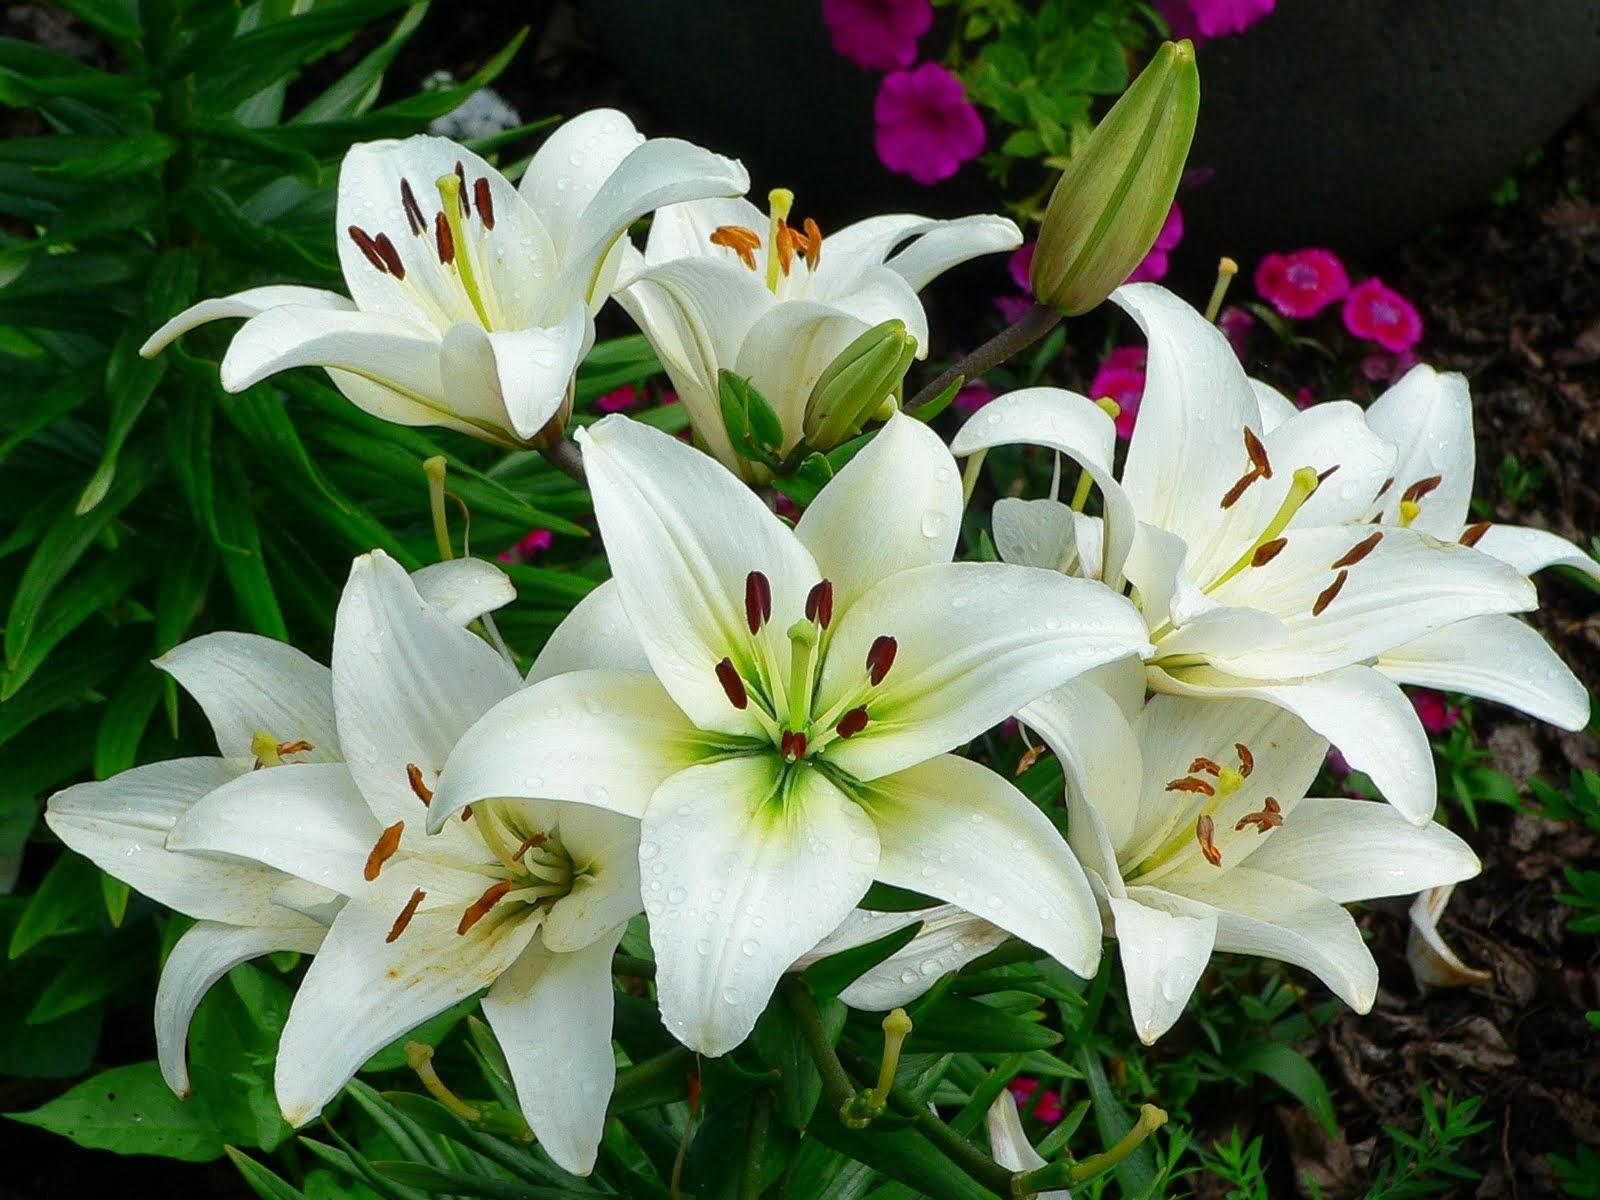 Koleksi Sketsa Gambar Bunga Amarilis